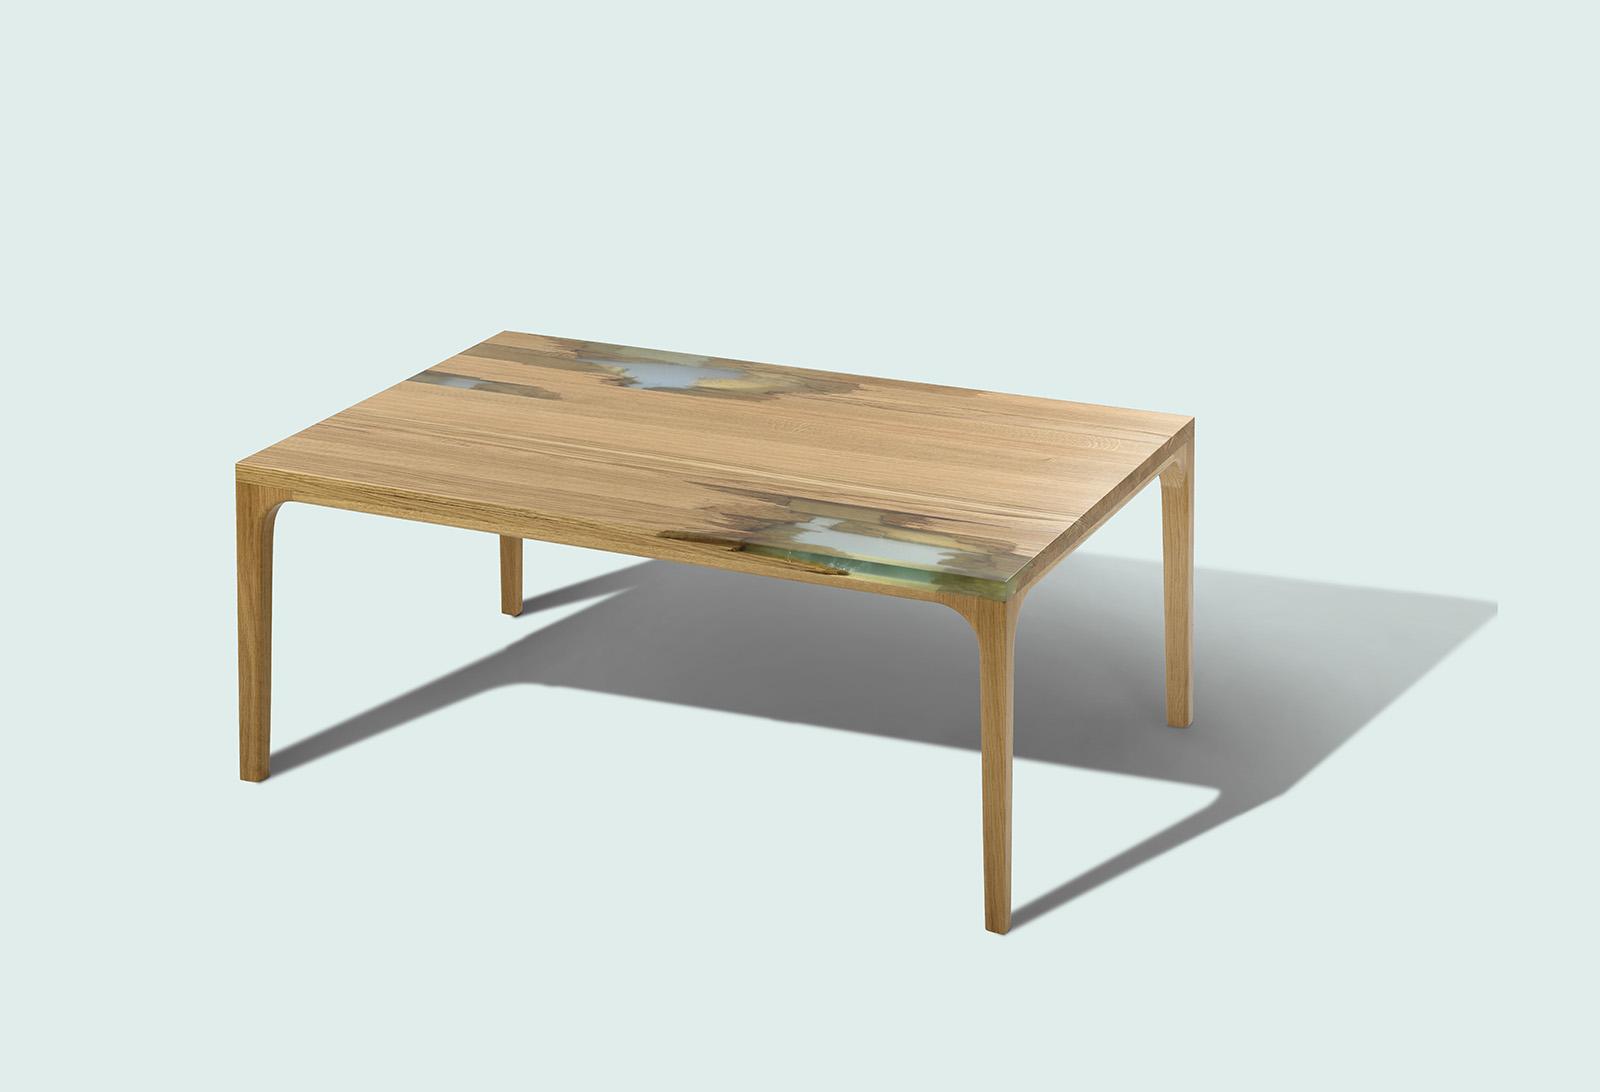 Werbefotografie Studio Oberfranken handgefertigter tisch der firma manufract